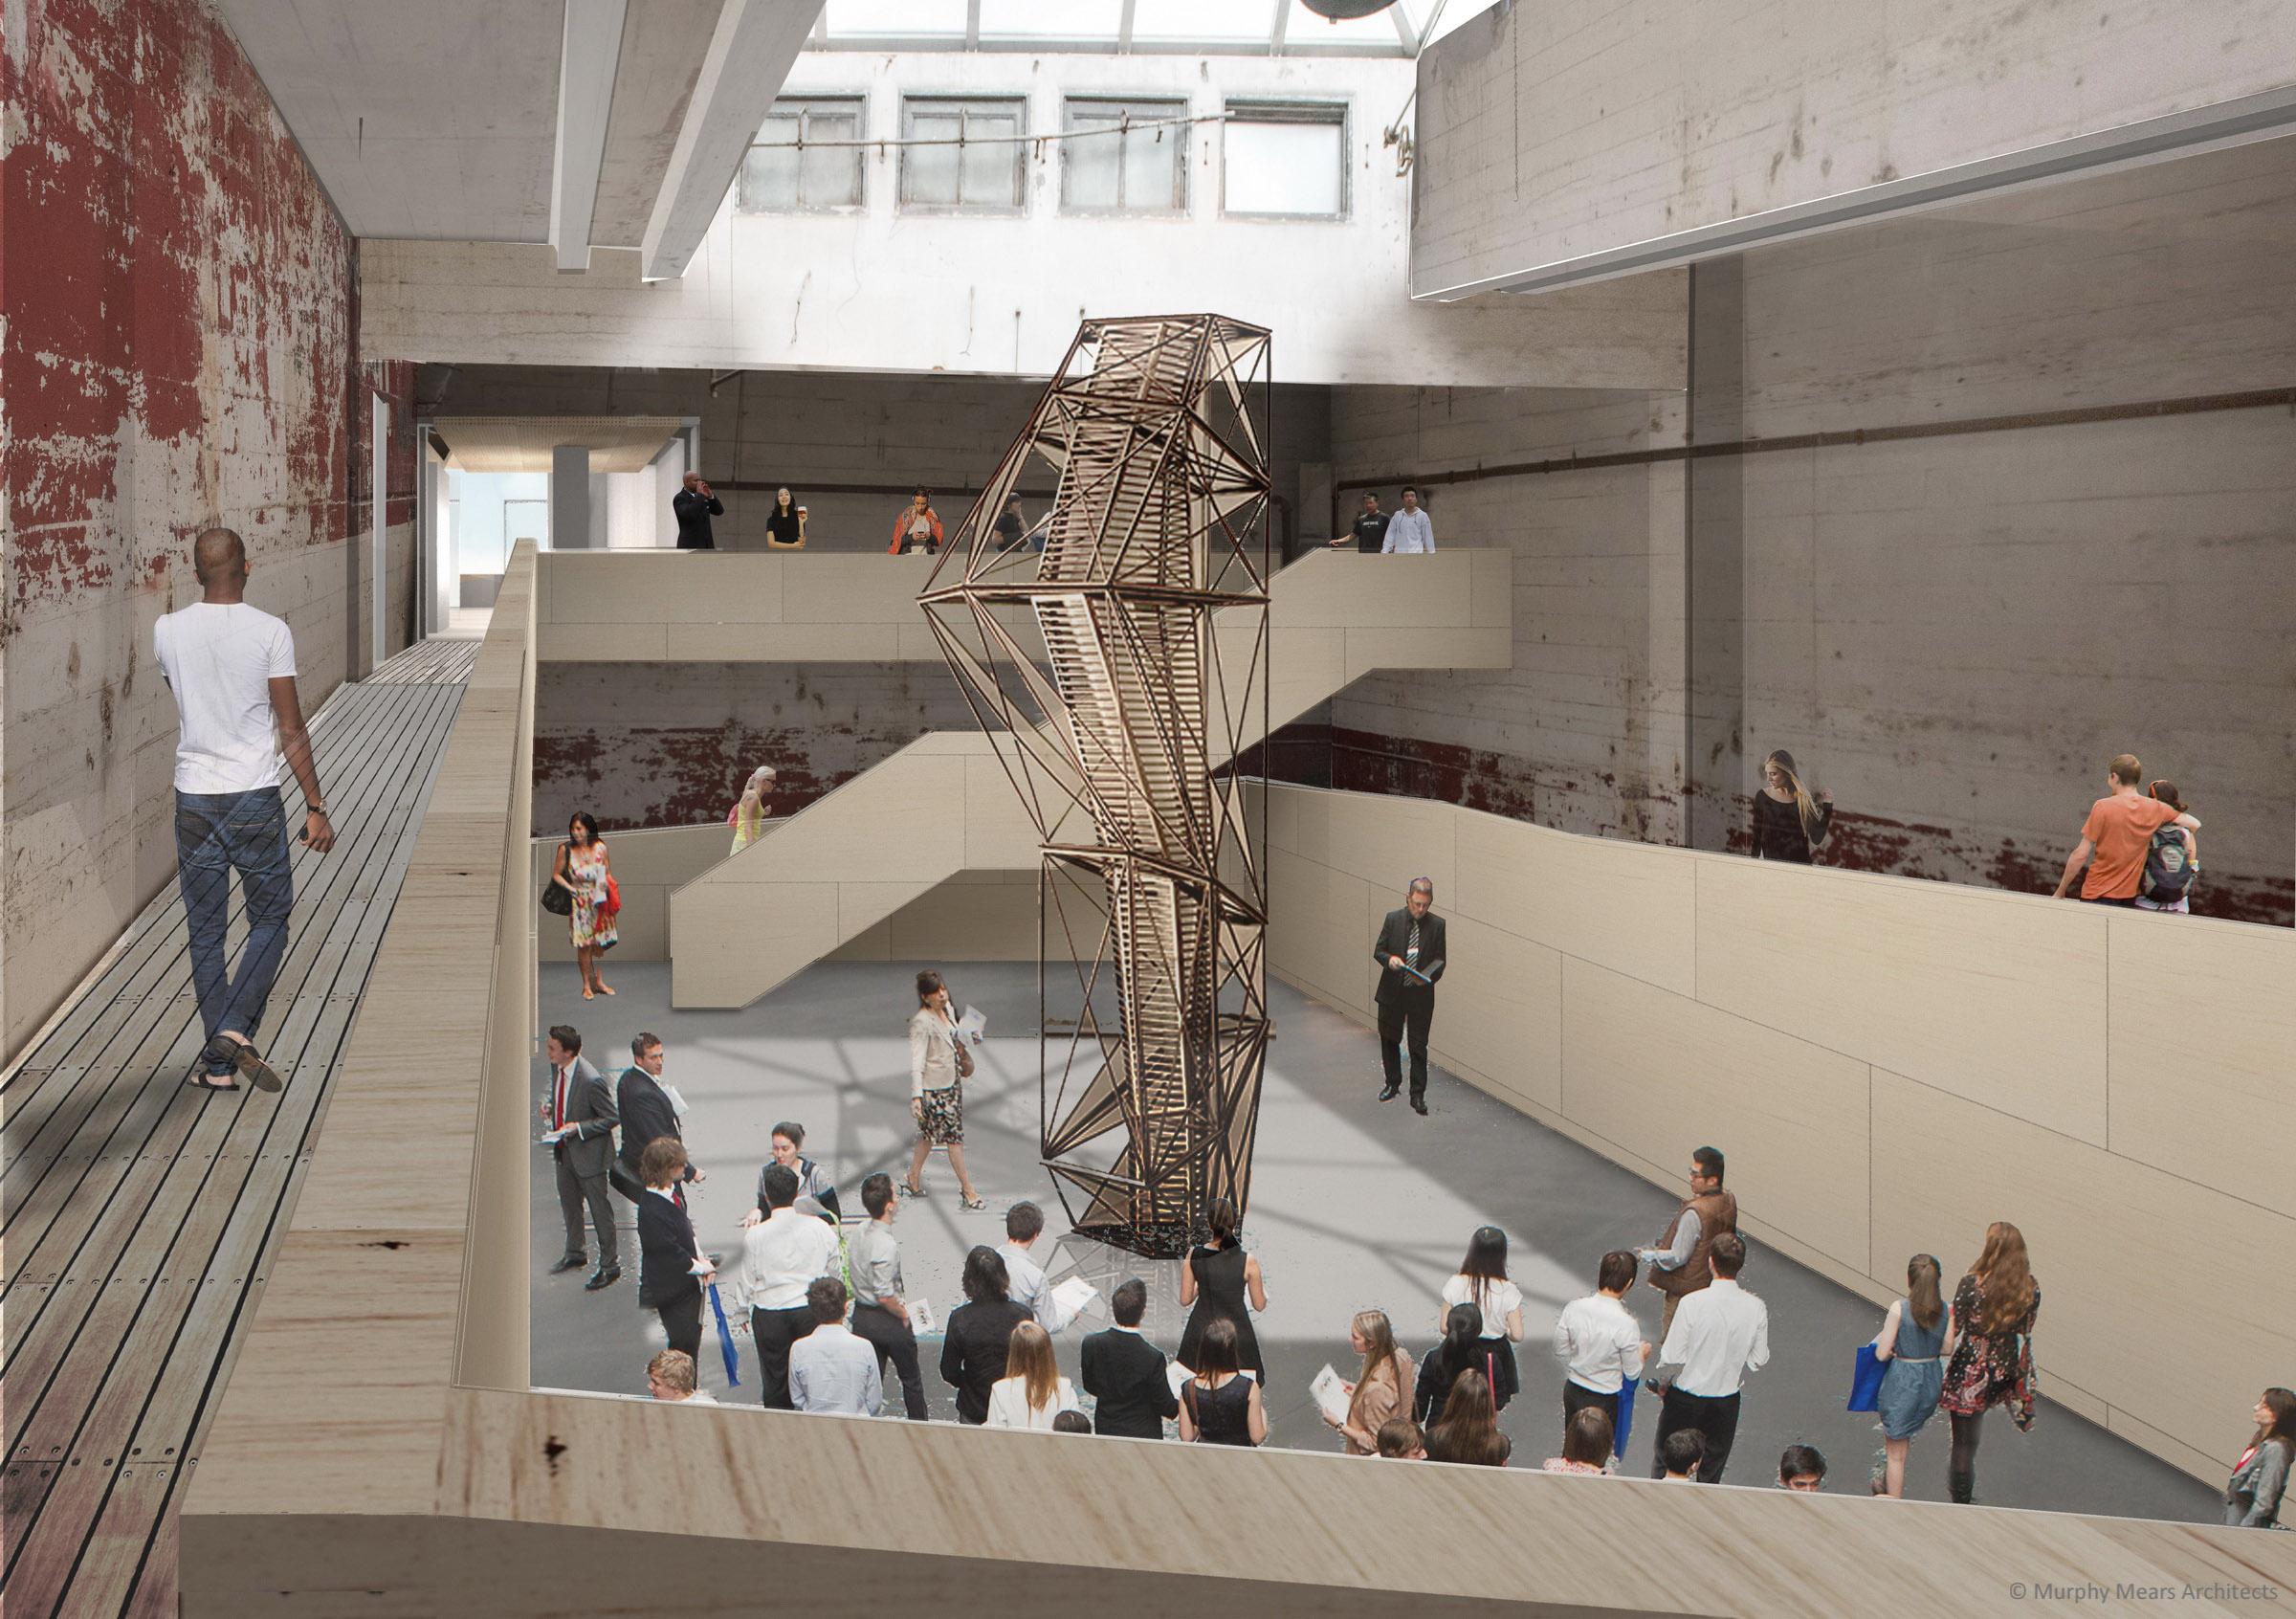 Architecture Center Houston - Competition Rendering - Ramp descending into Boiler Room.